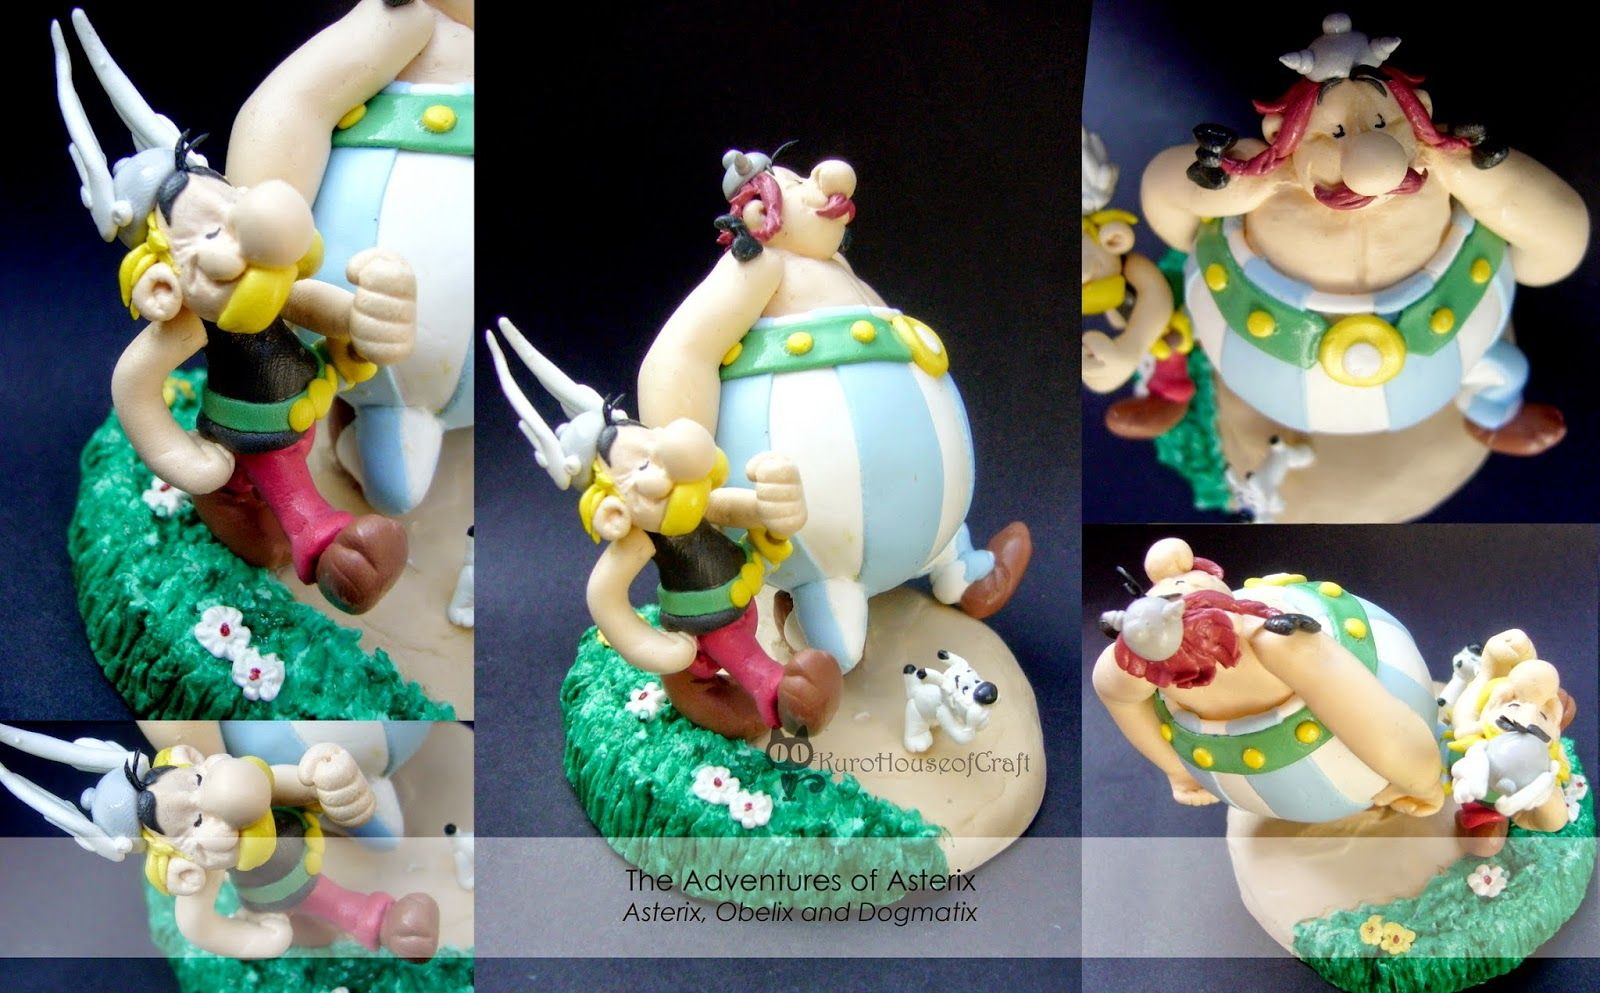 Mini Diorama Clay The Adventure Of Asterix Asterix Obelix And Dogmatix